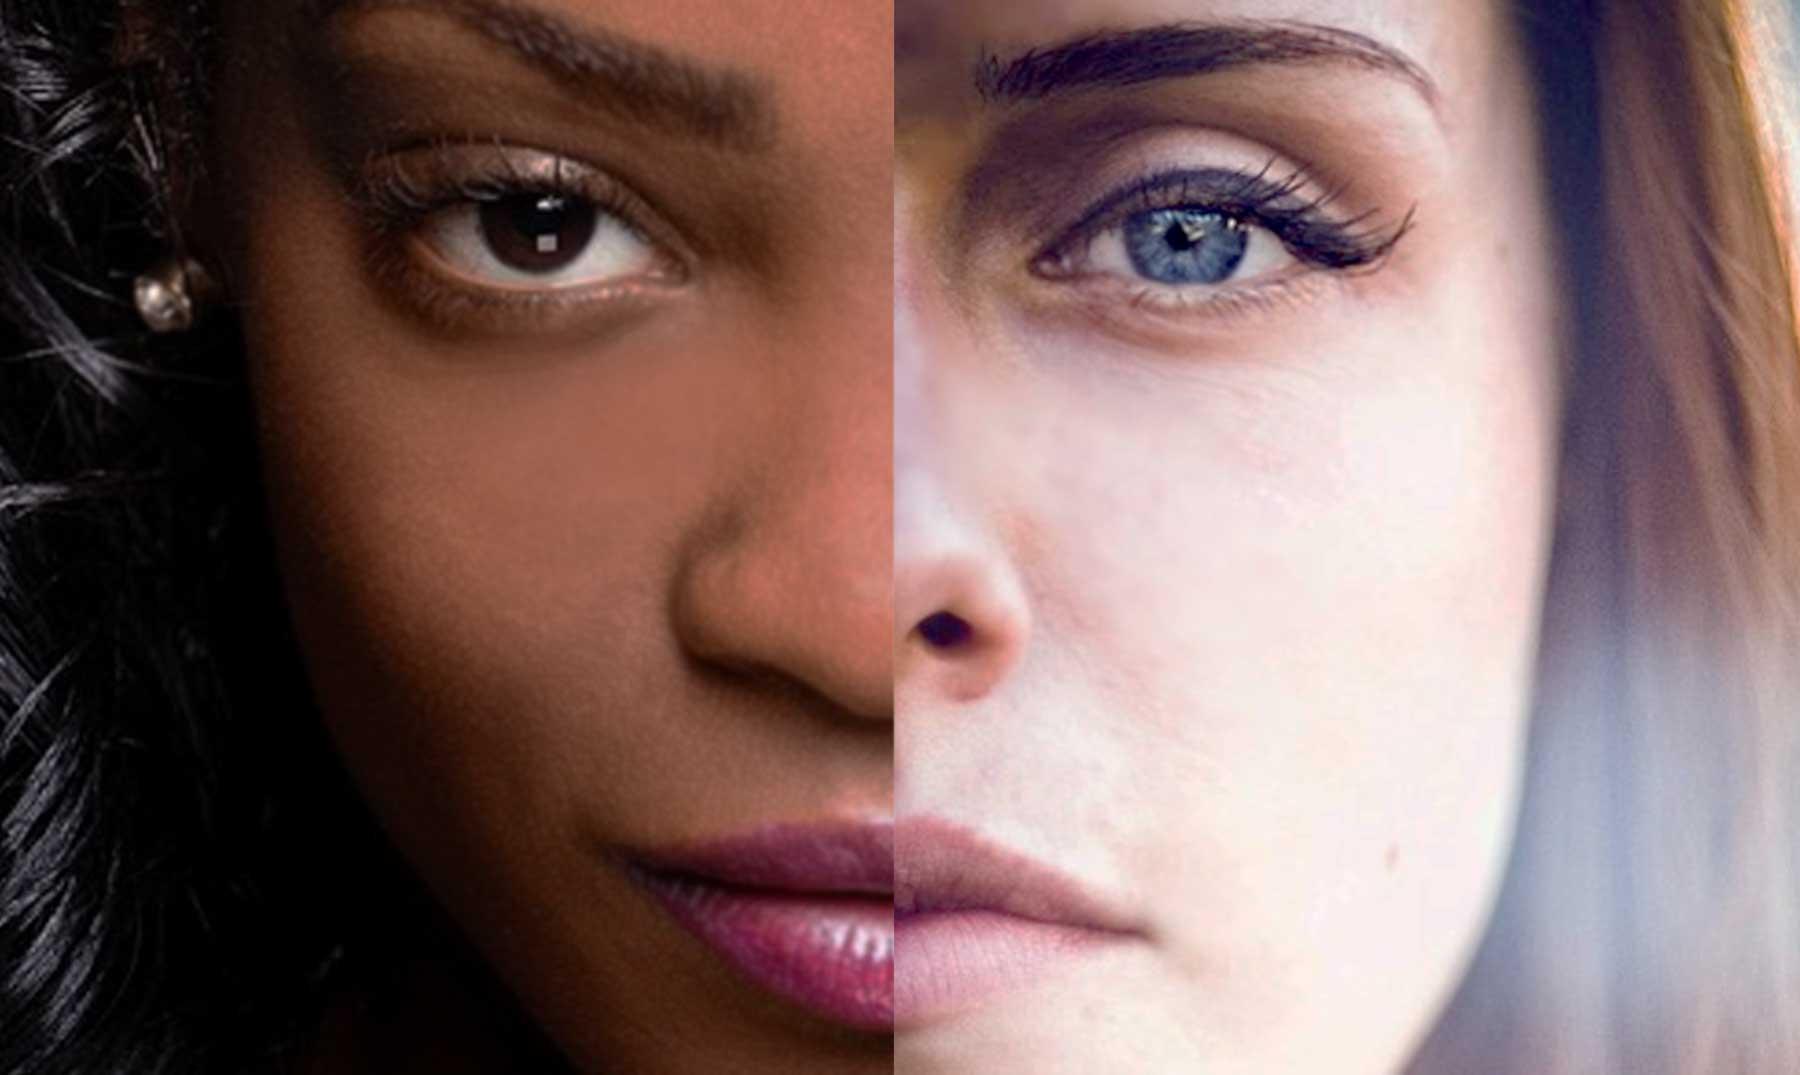 Facebook mujer piel oscura